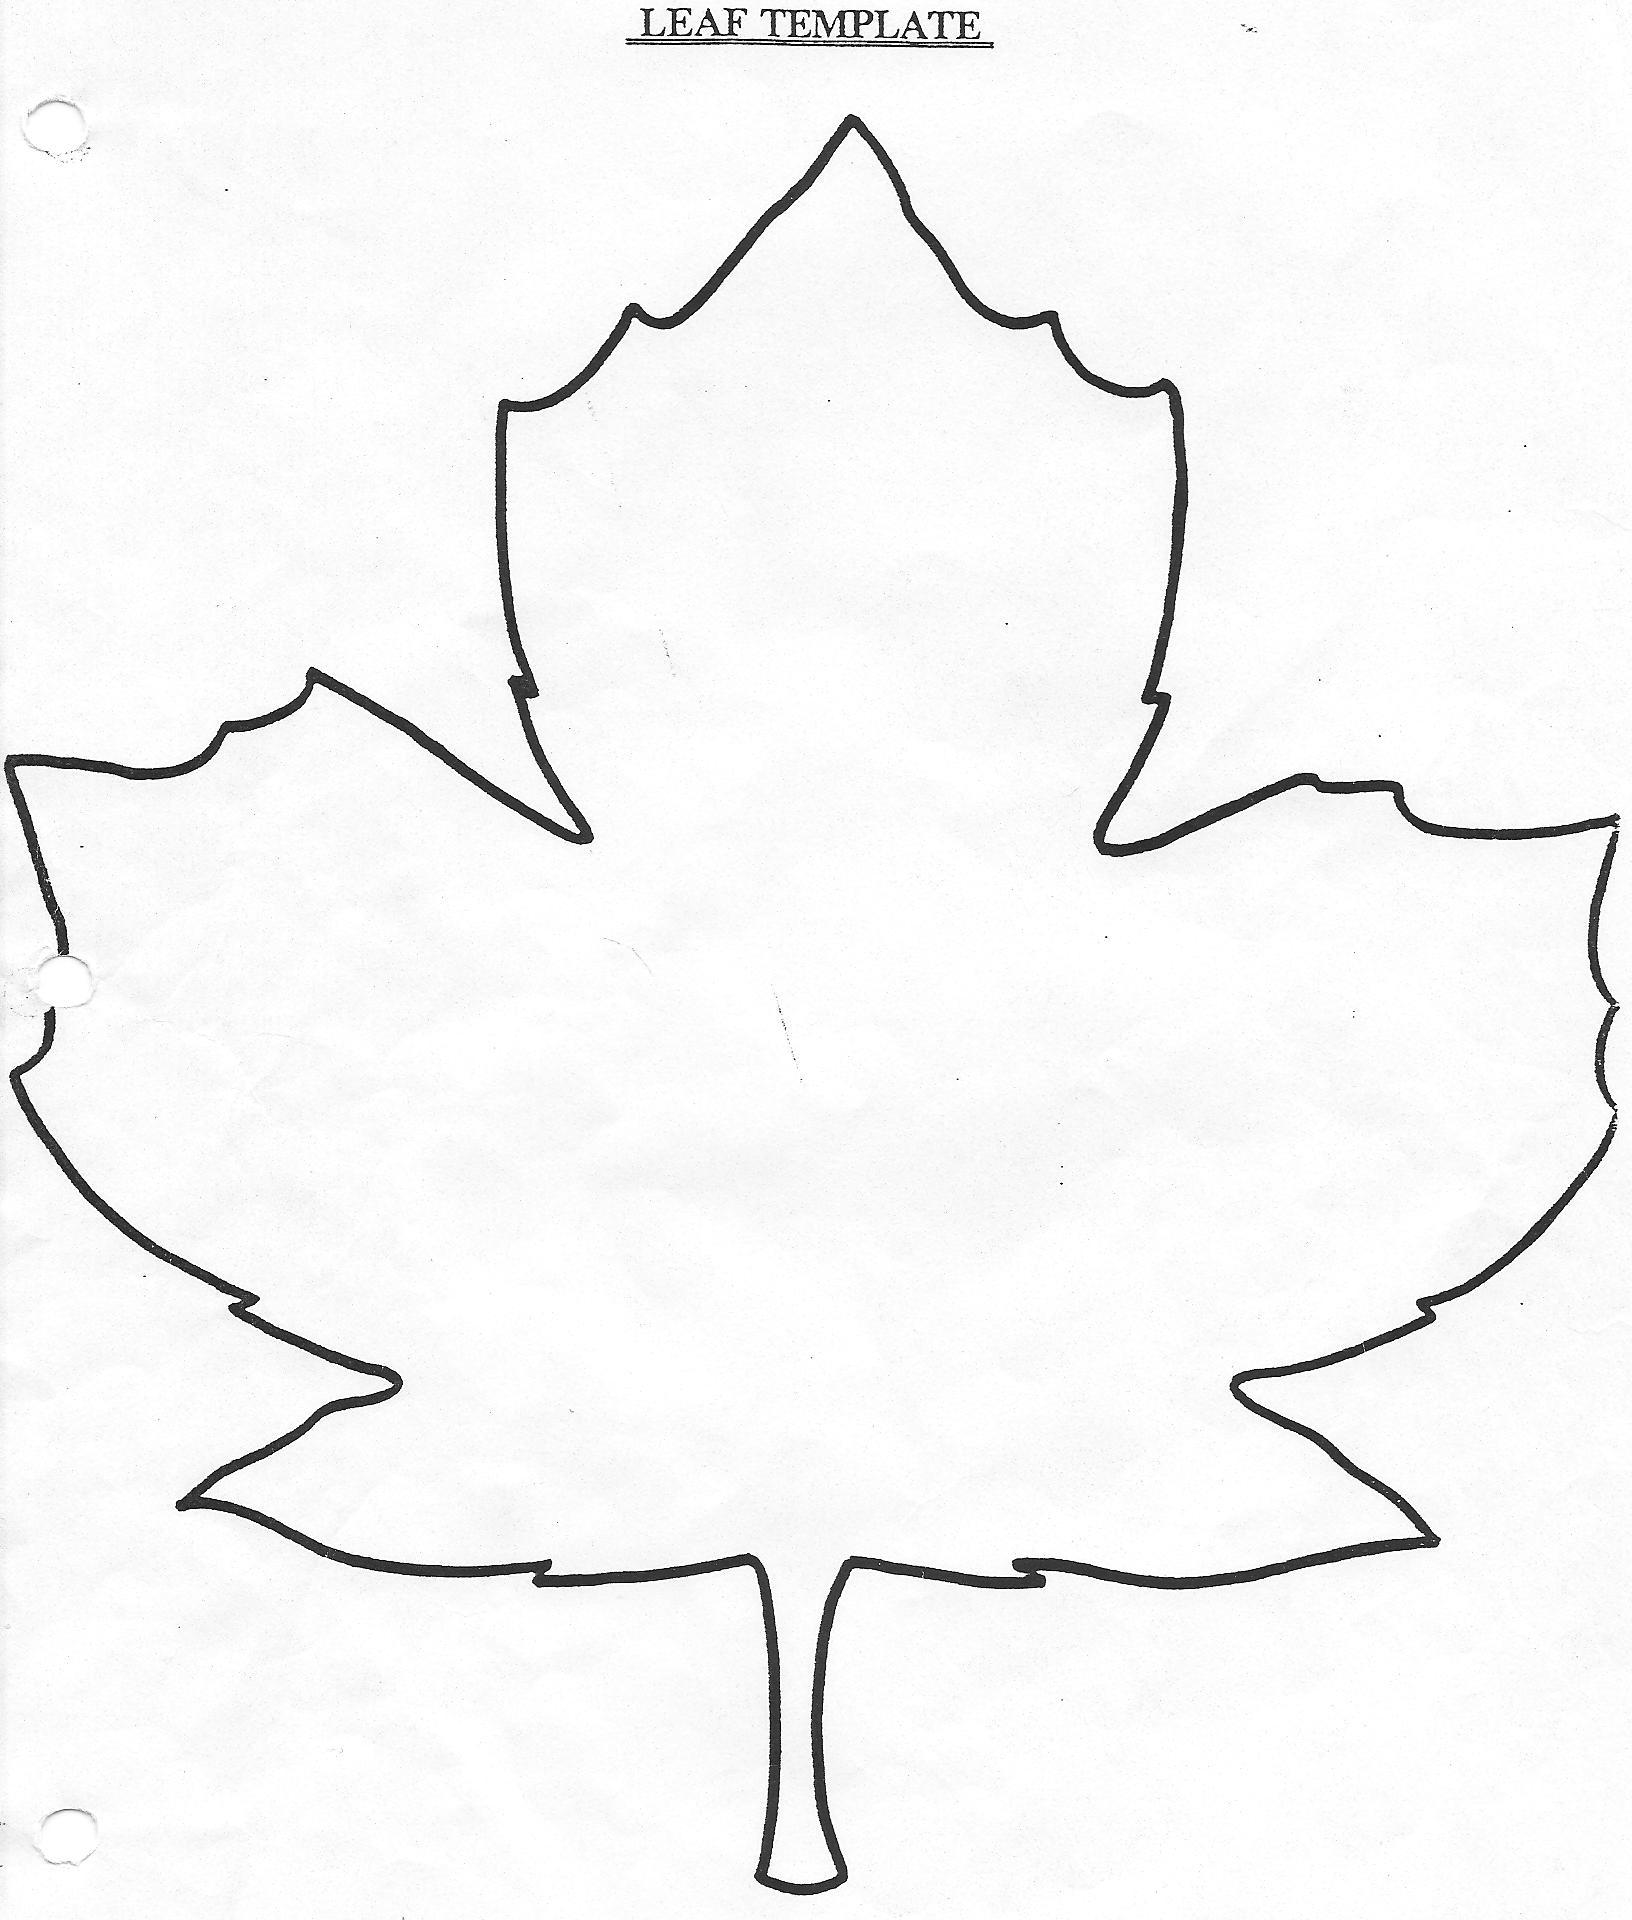 Line Drawing Of Leaves At Getdrawings